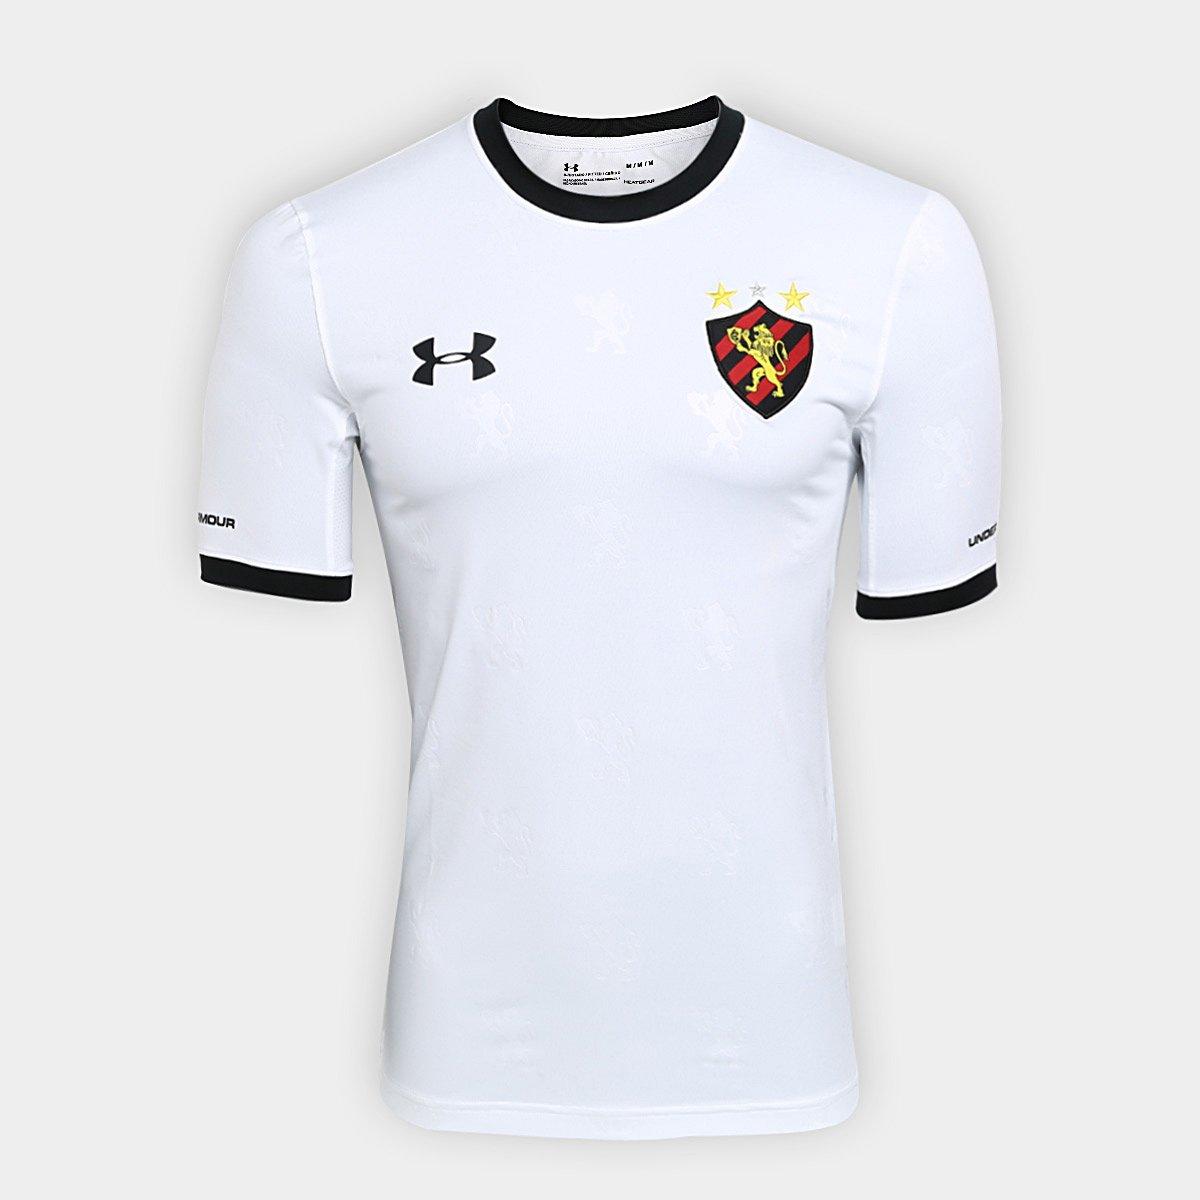 81dcf9905e3 Camisa Sport Recife II 2018 s n° - Jogador Under Armour Masculina